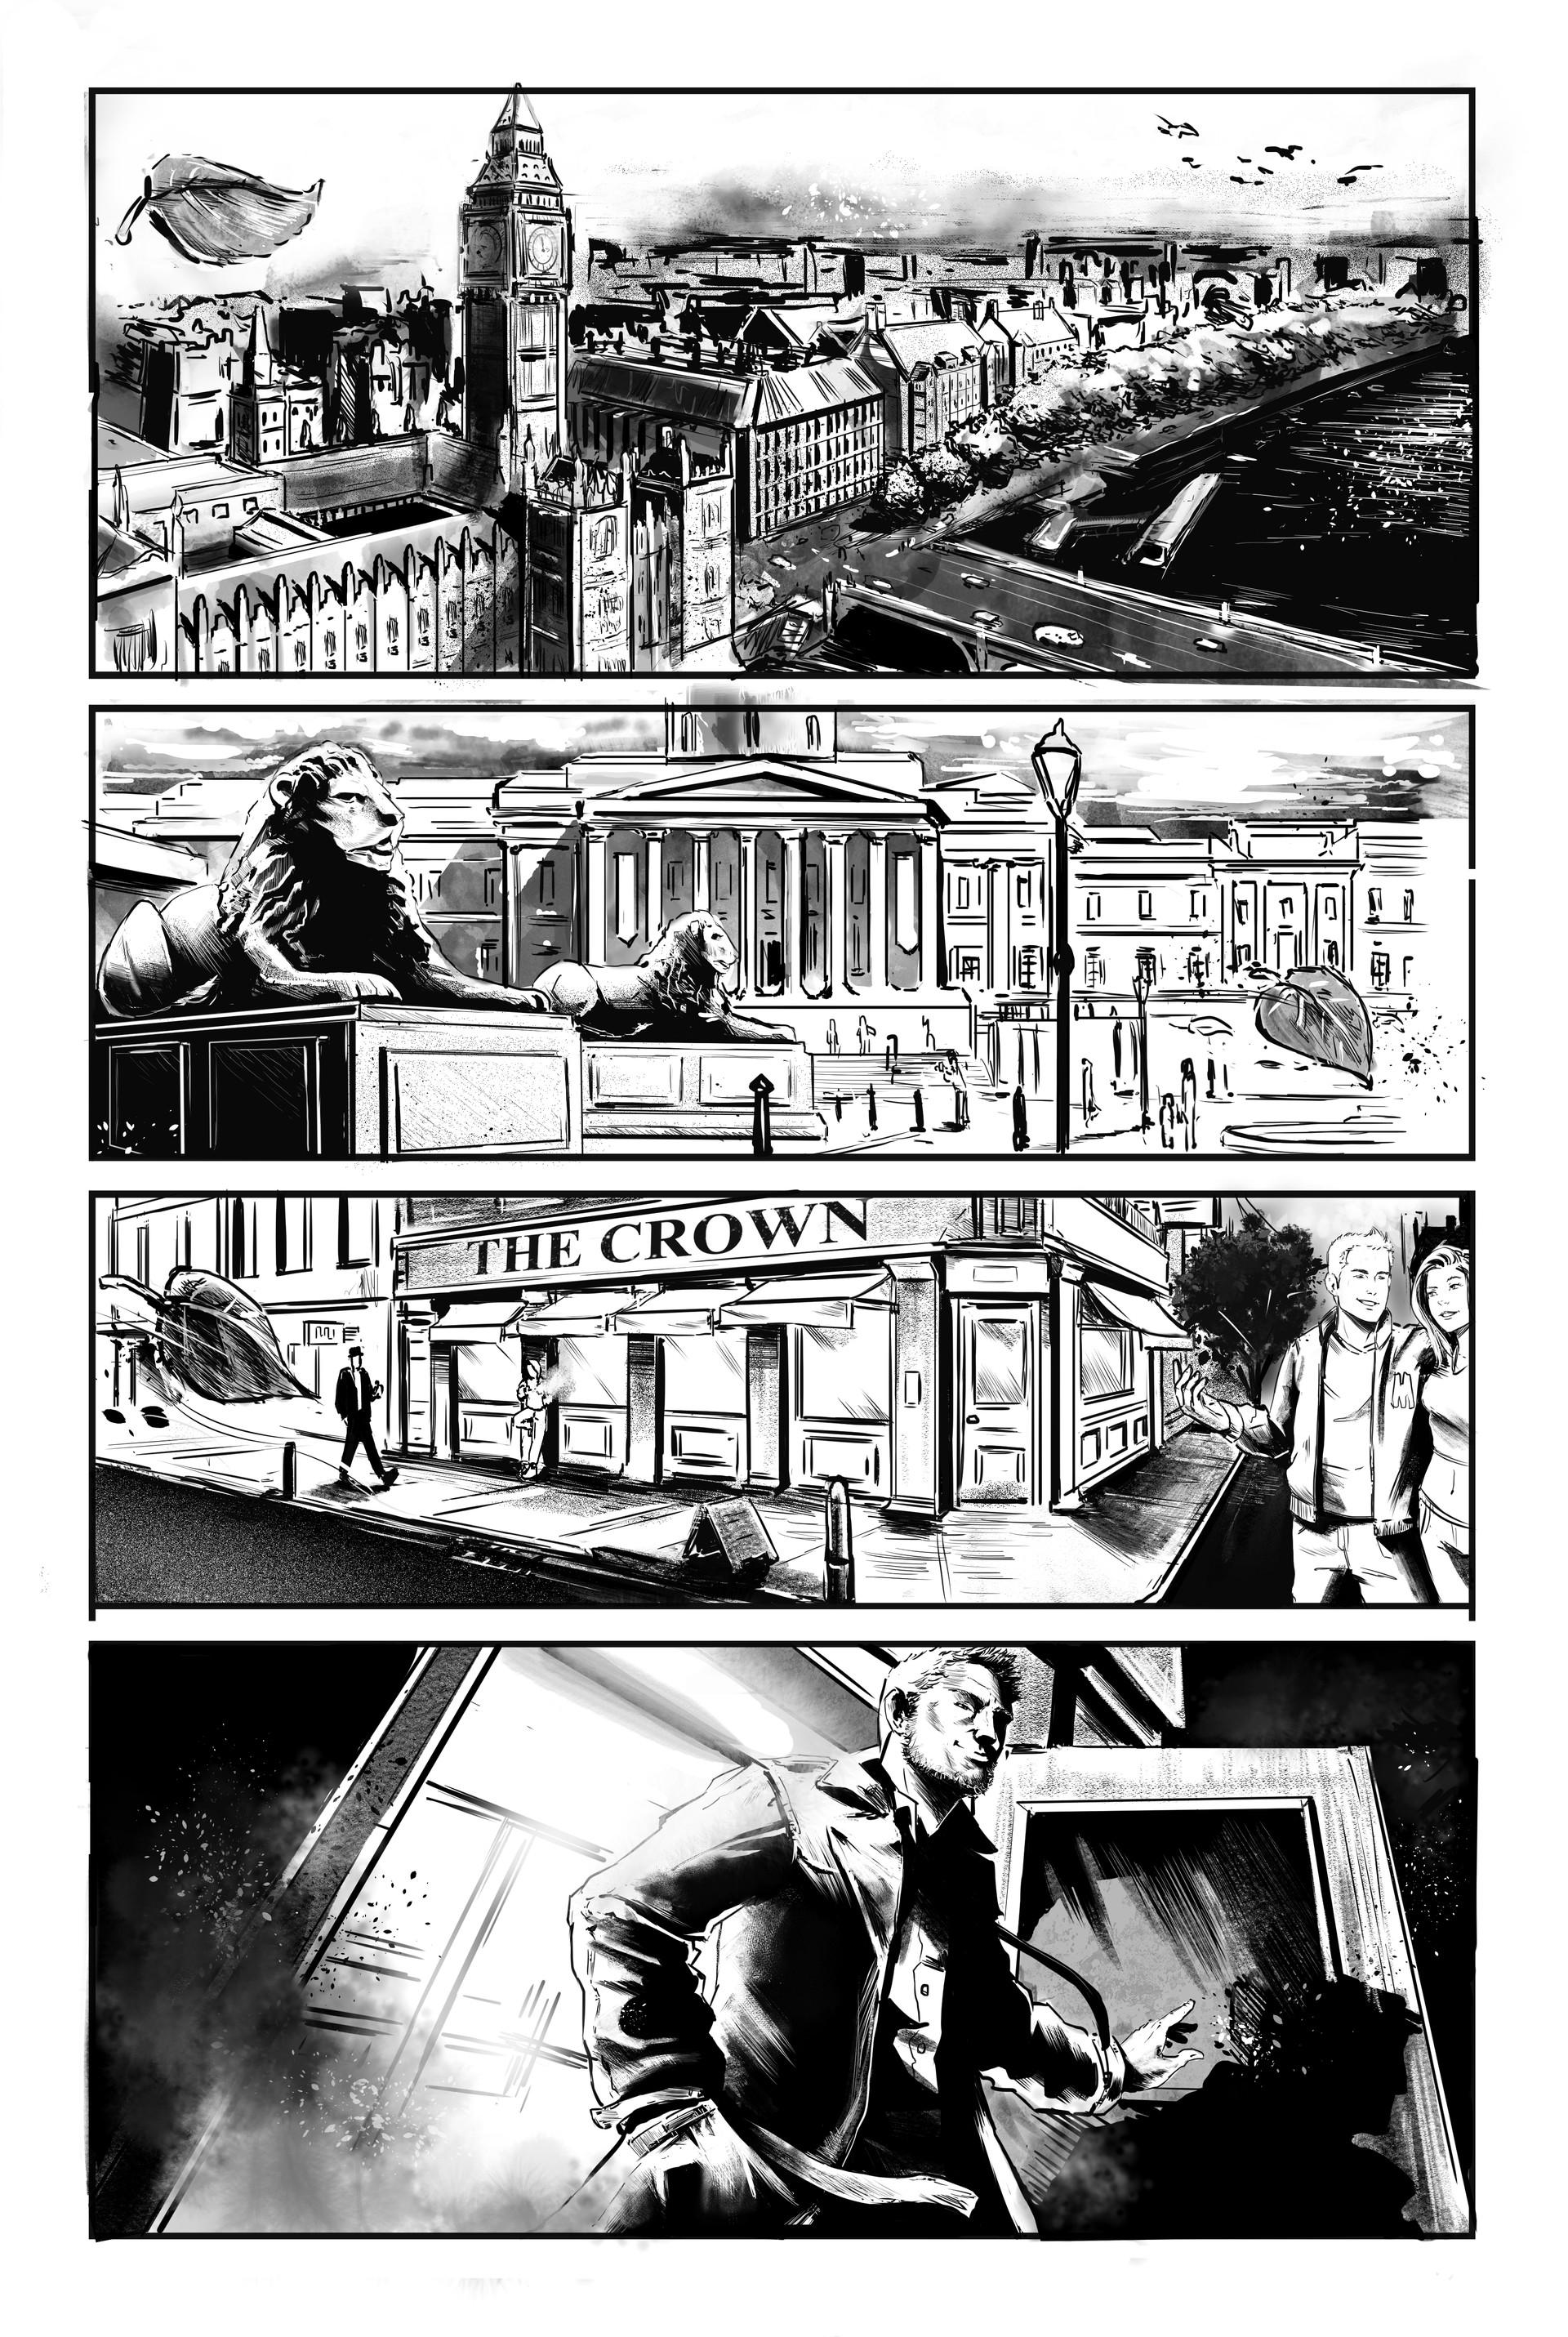 Felipe sanz page1 v2